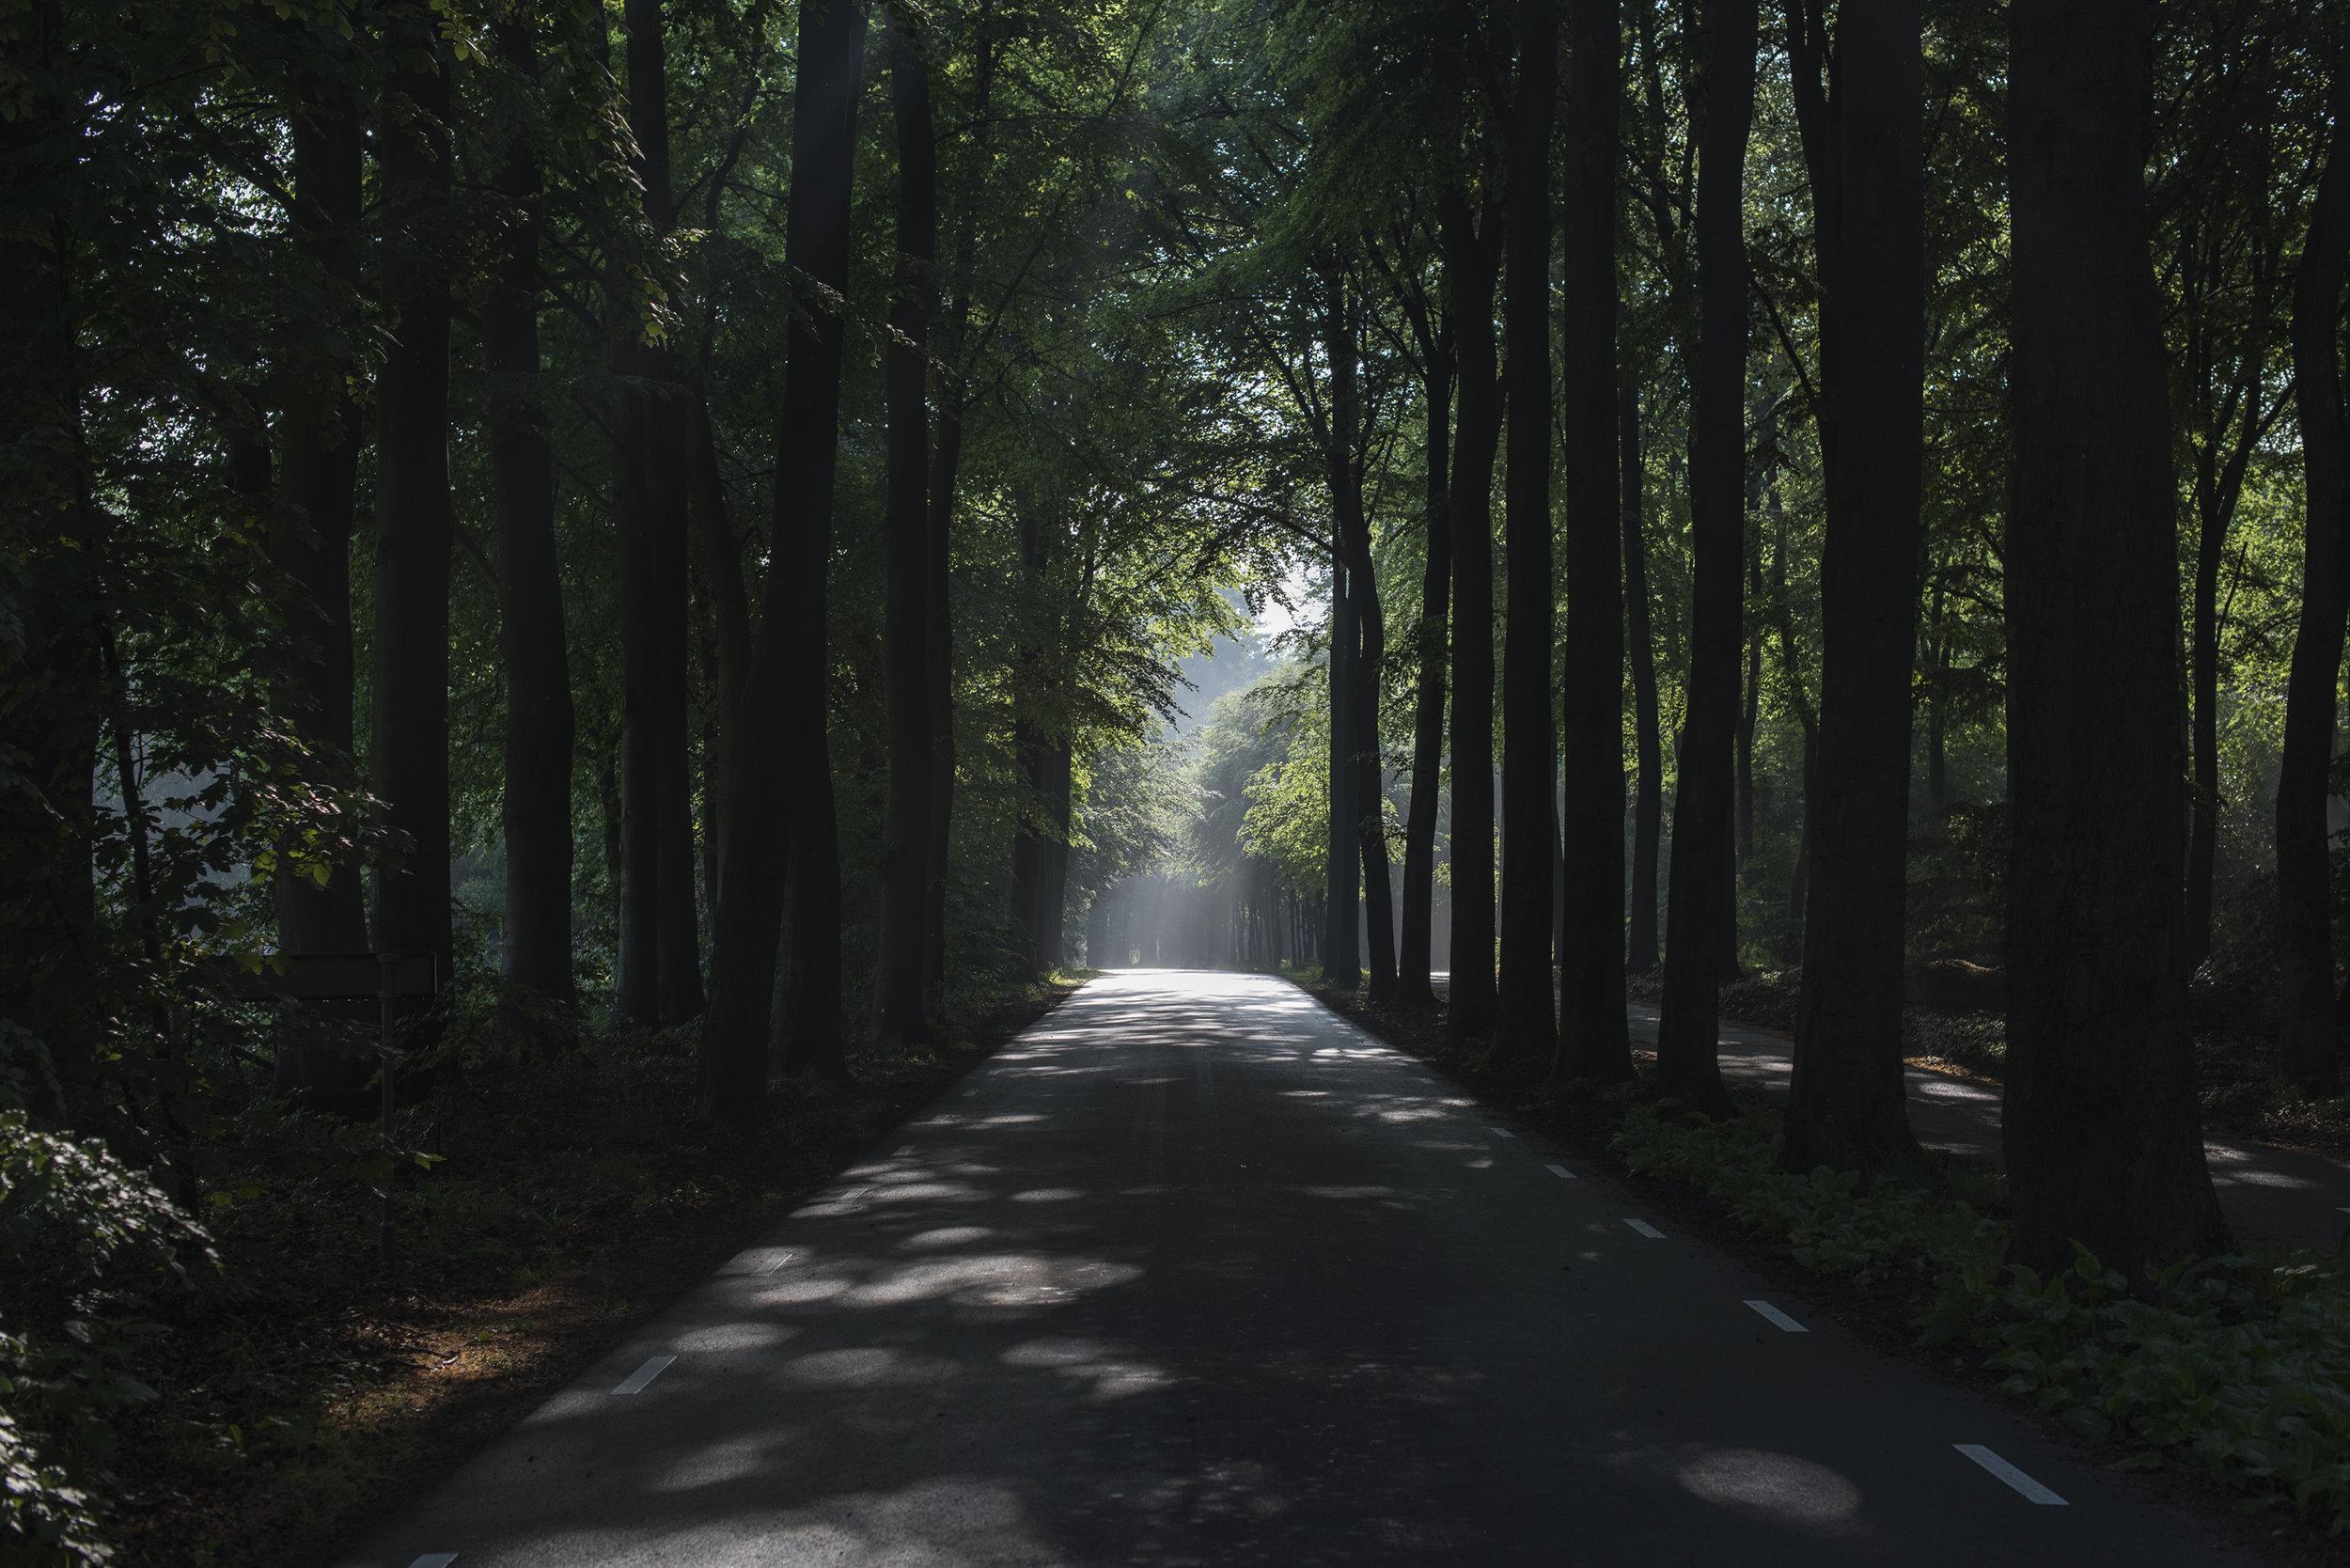 259656-© Yorit Kluitman - Gemeente Ermelo-68c64c-original-1506604986.jpg